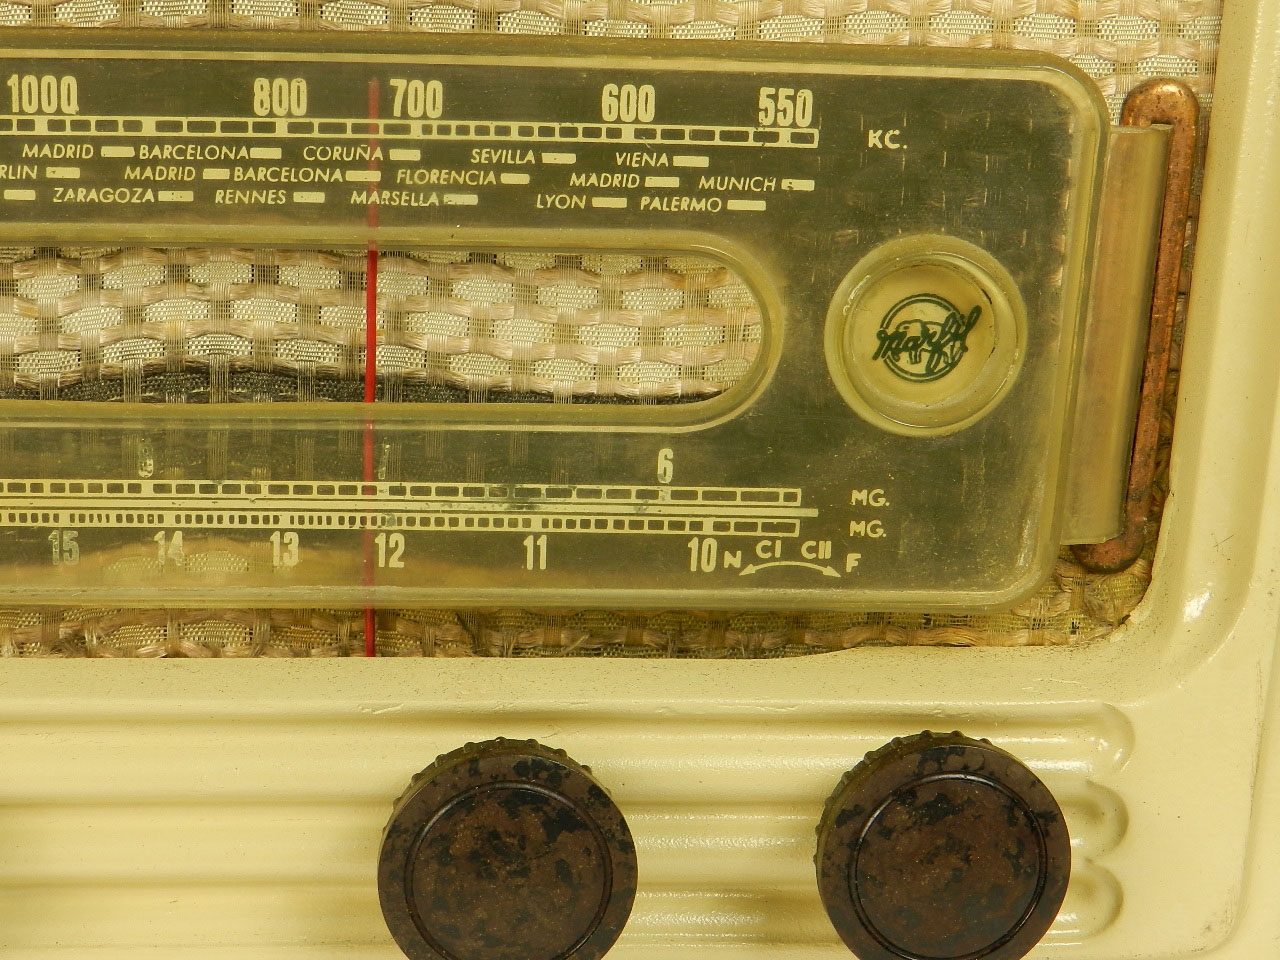 Imagen RADIO MARFIL AN-355 O.M  AÑO 1950 25921